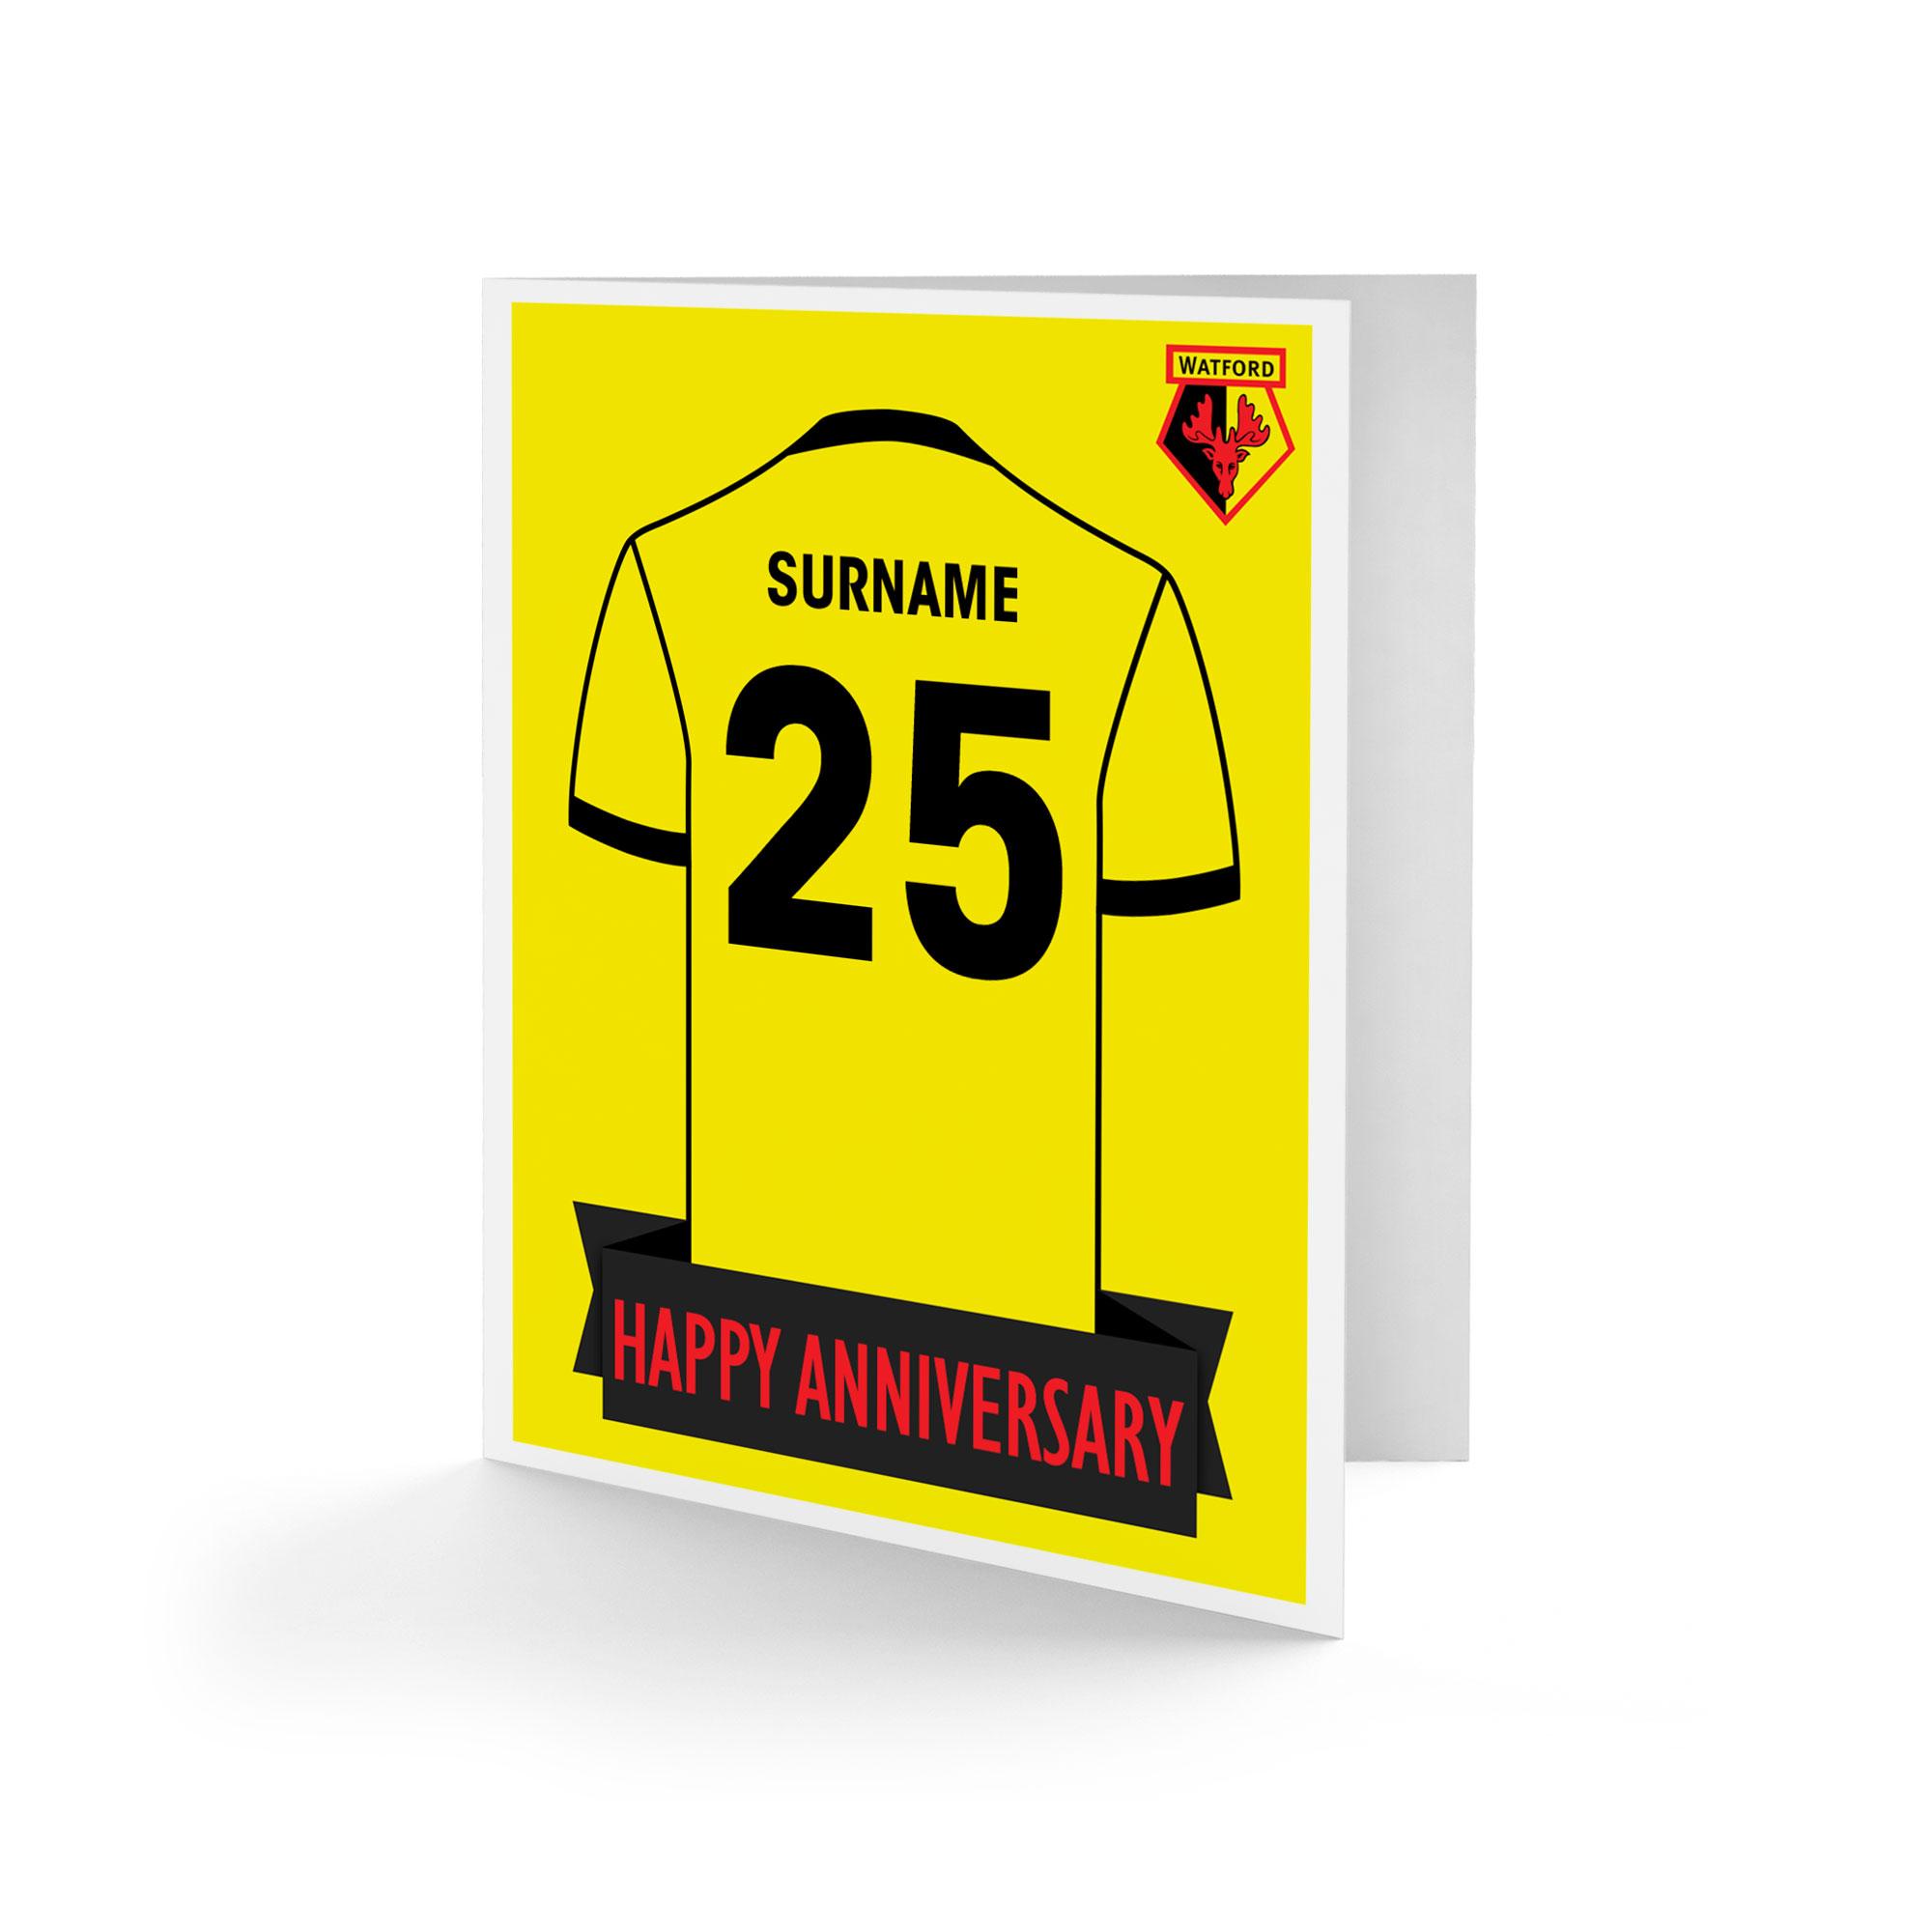 Watford FC Shirt Anniversary Card